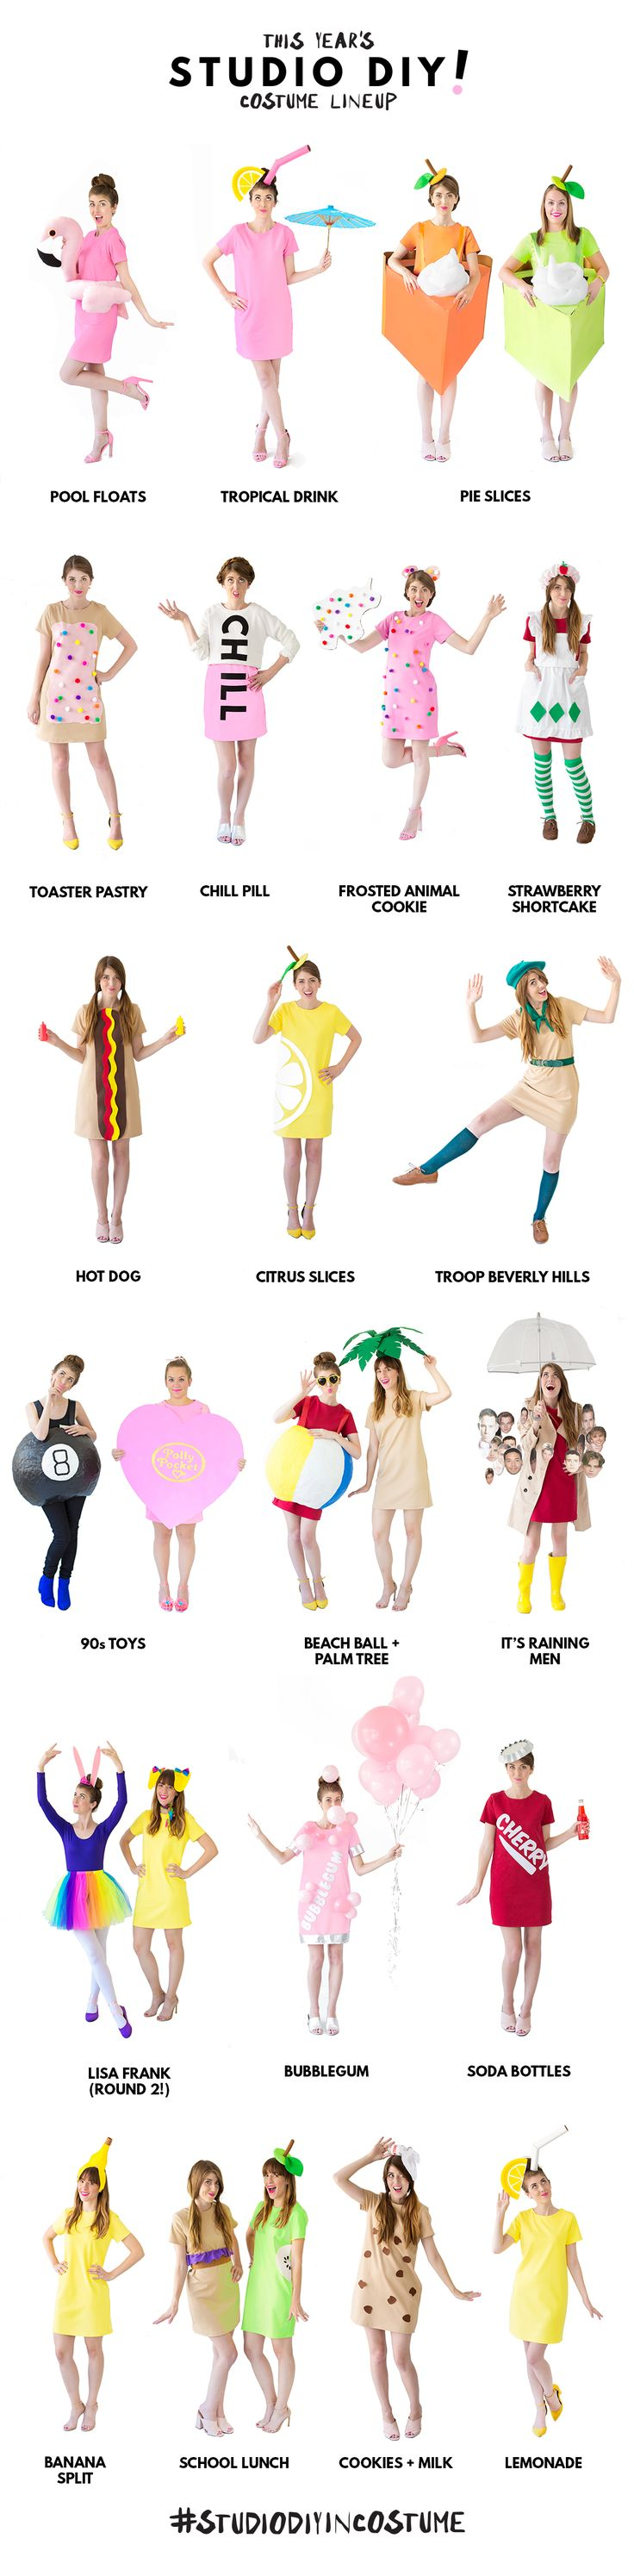 Studio DIY 2016 Costume Lineup